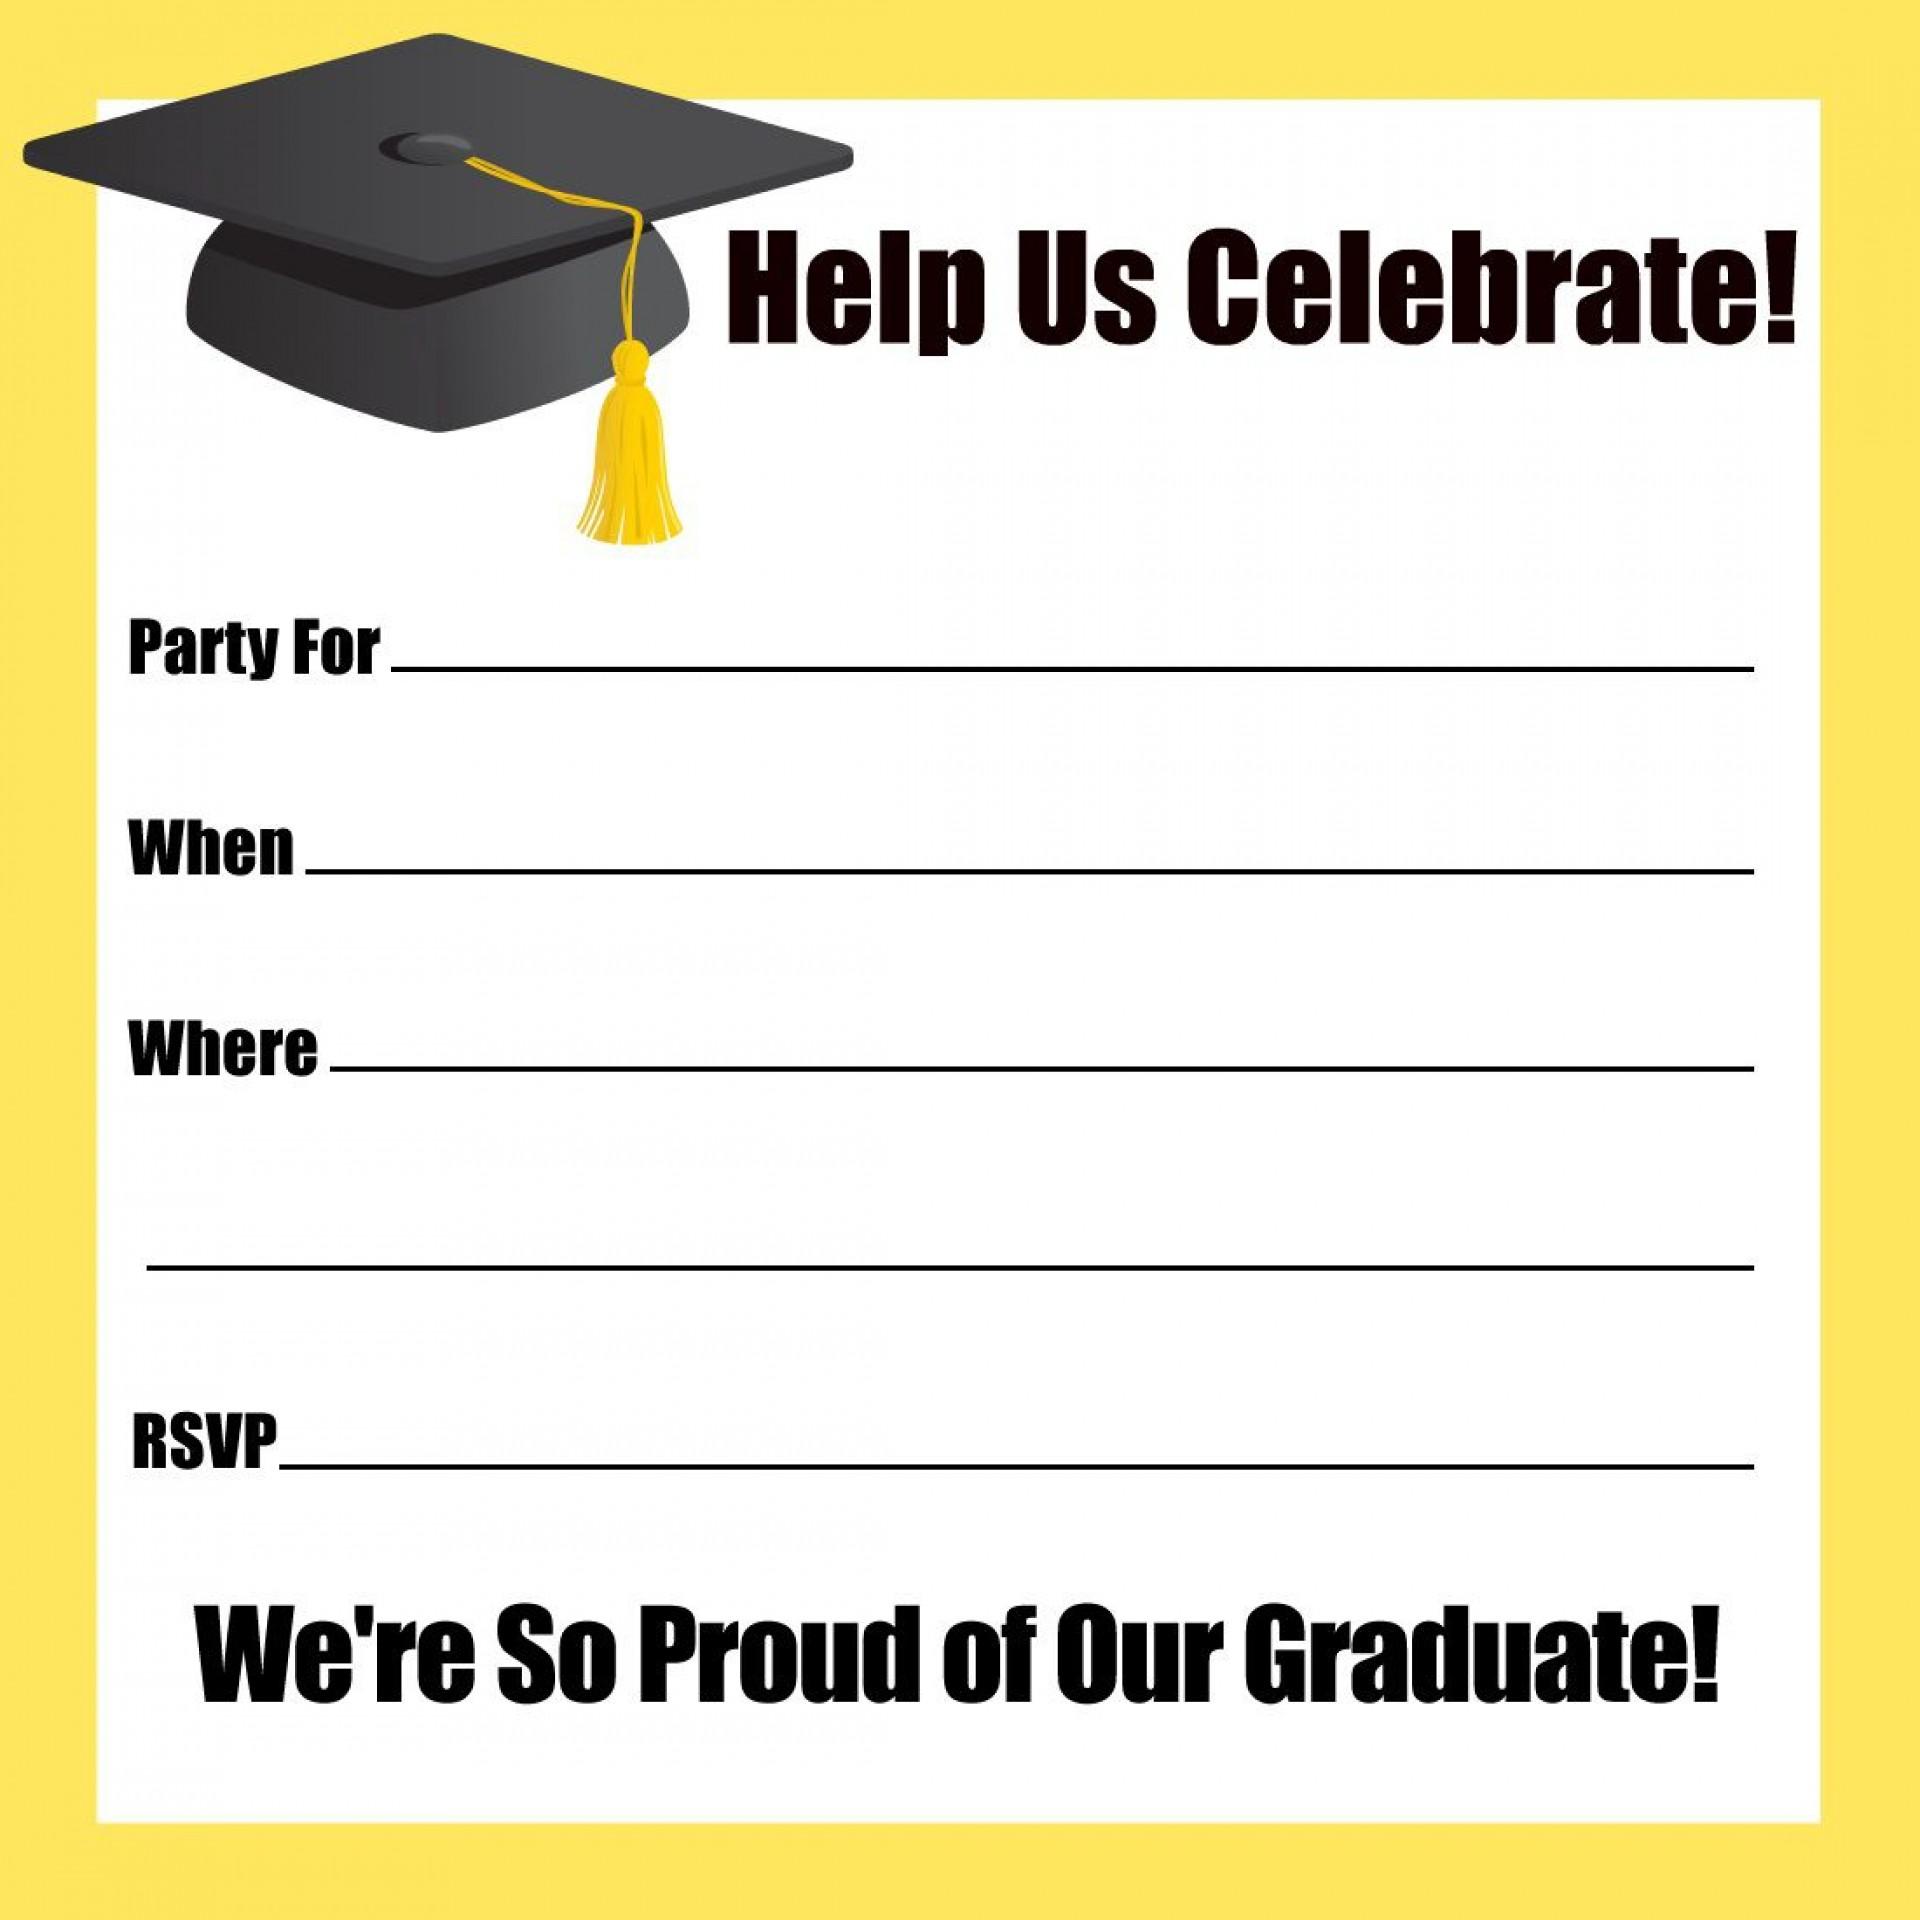 003 Unforgettable Graduation Party Invitation Template Picture  Templates 4 Per Page Free Reception1920